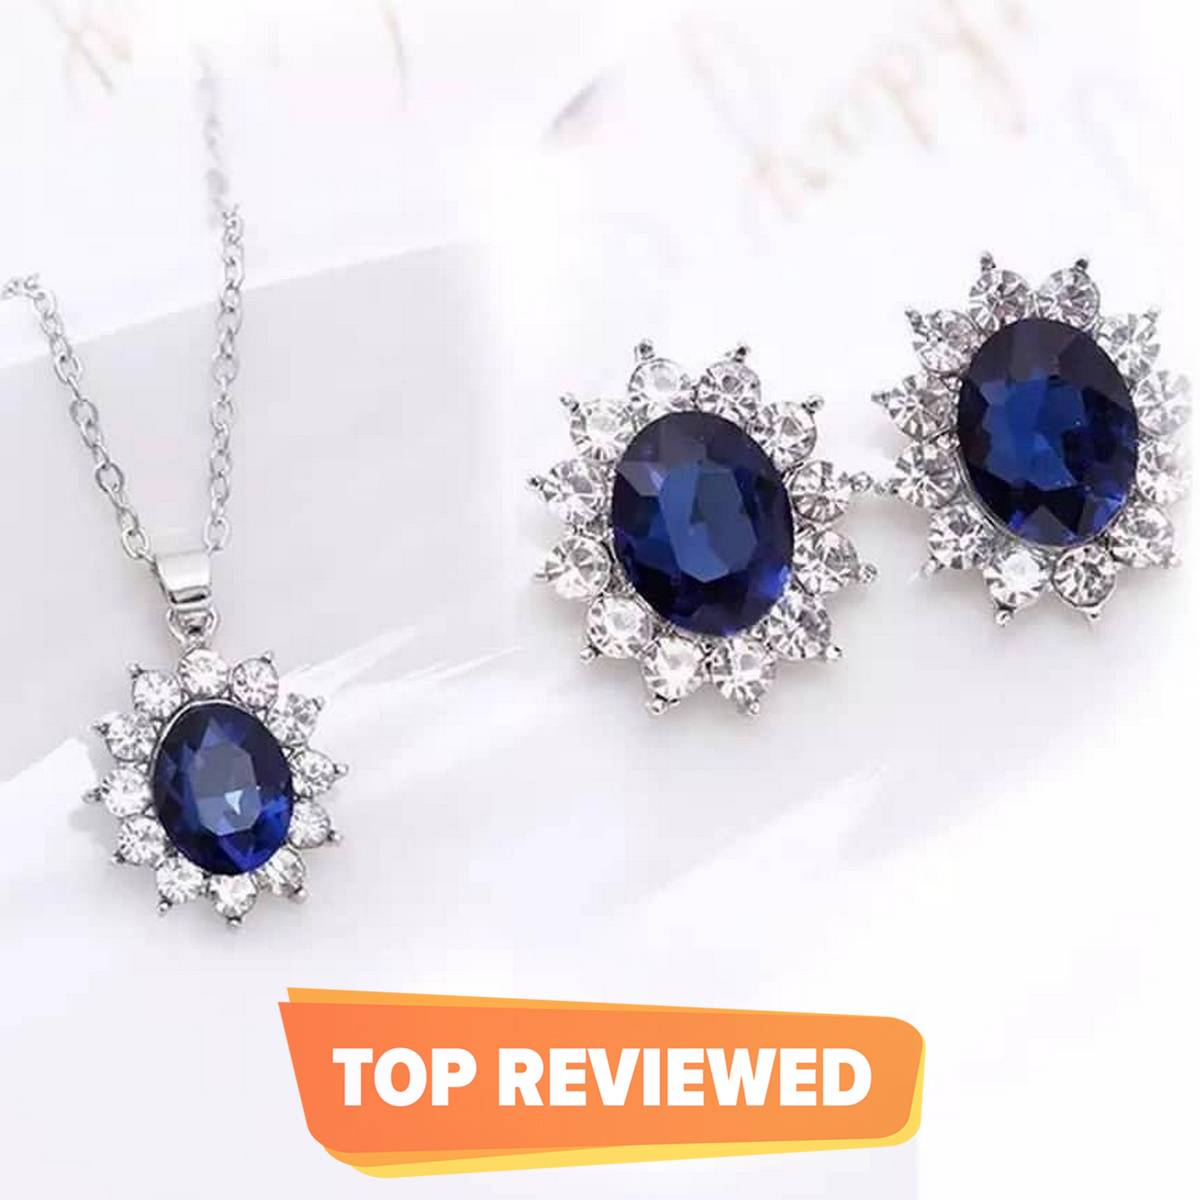 Royal Blue Stone Jewelry Set For Women & Girls - Silver